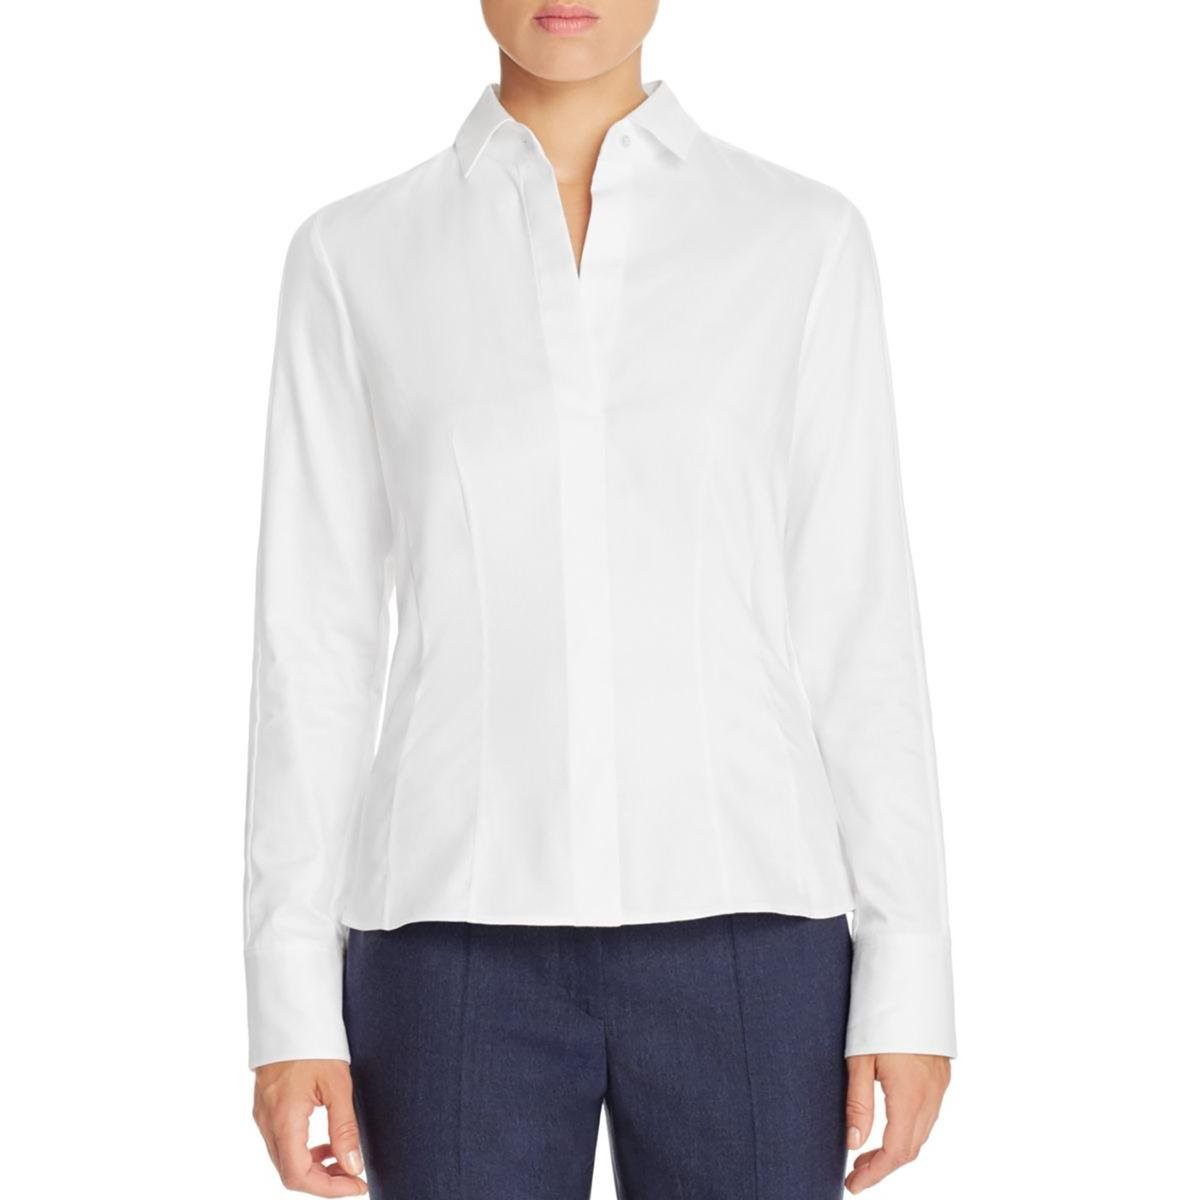 BOSS Hugo Boss Womens Bashina6 Side Zip Cotton Button-Down Top White 10 by Hugo Boss (Image #1)